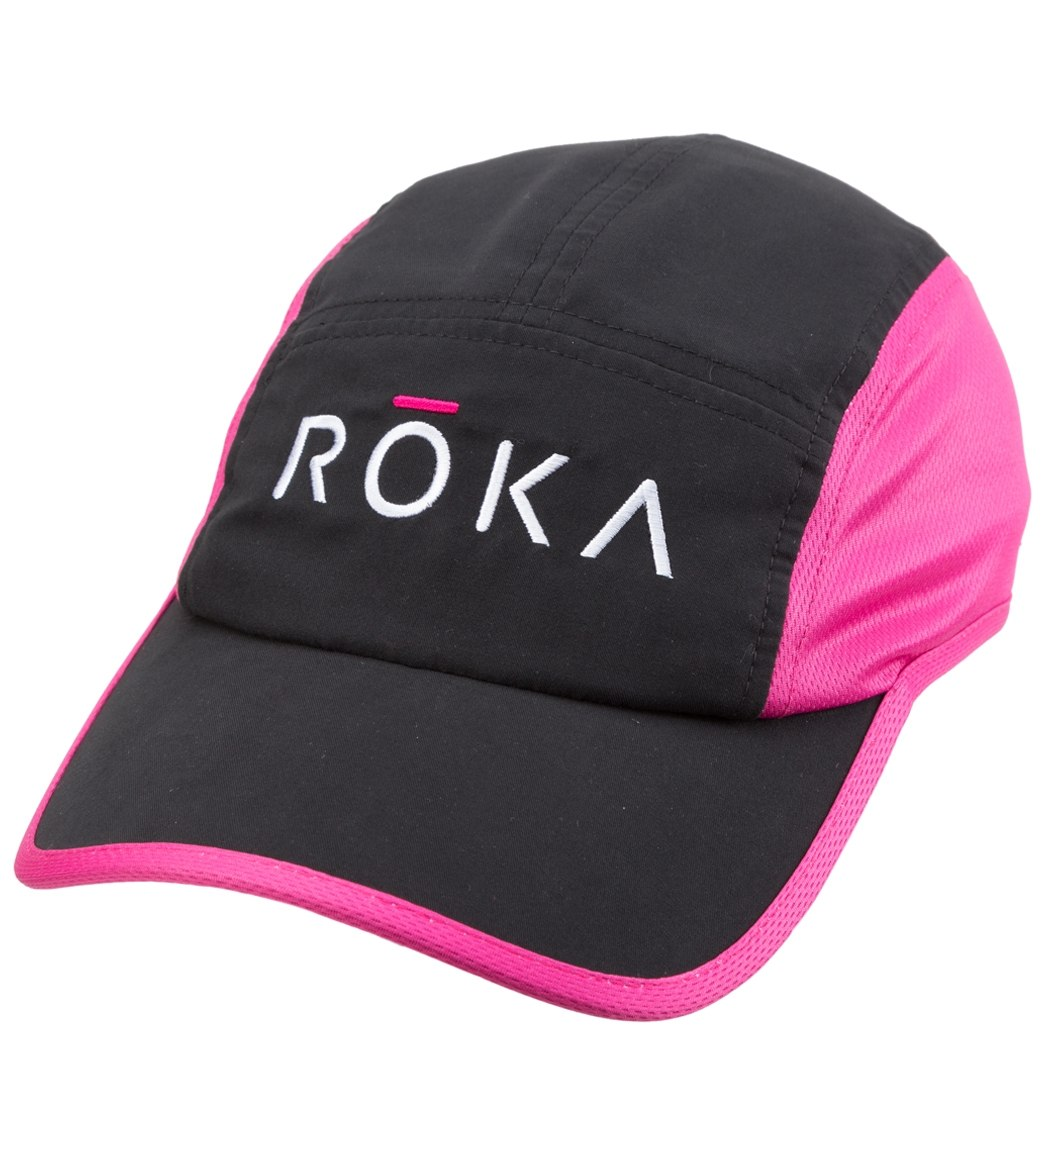 1c6a3aecd3 ROKA Sports Endurance Run Hat at SwimOutlet.com